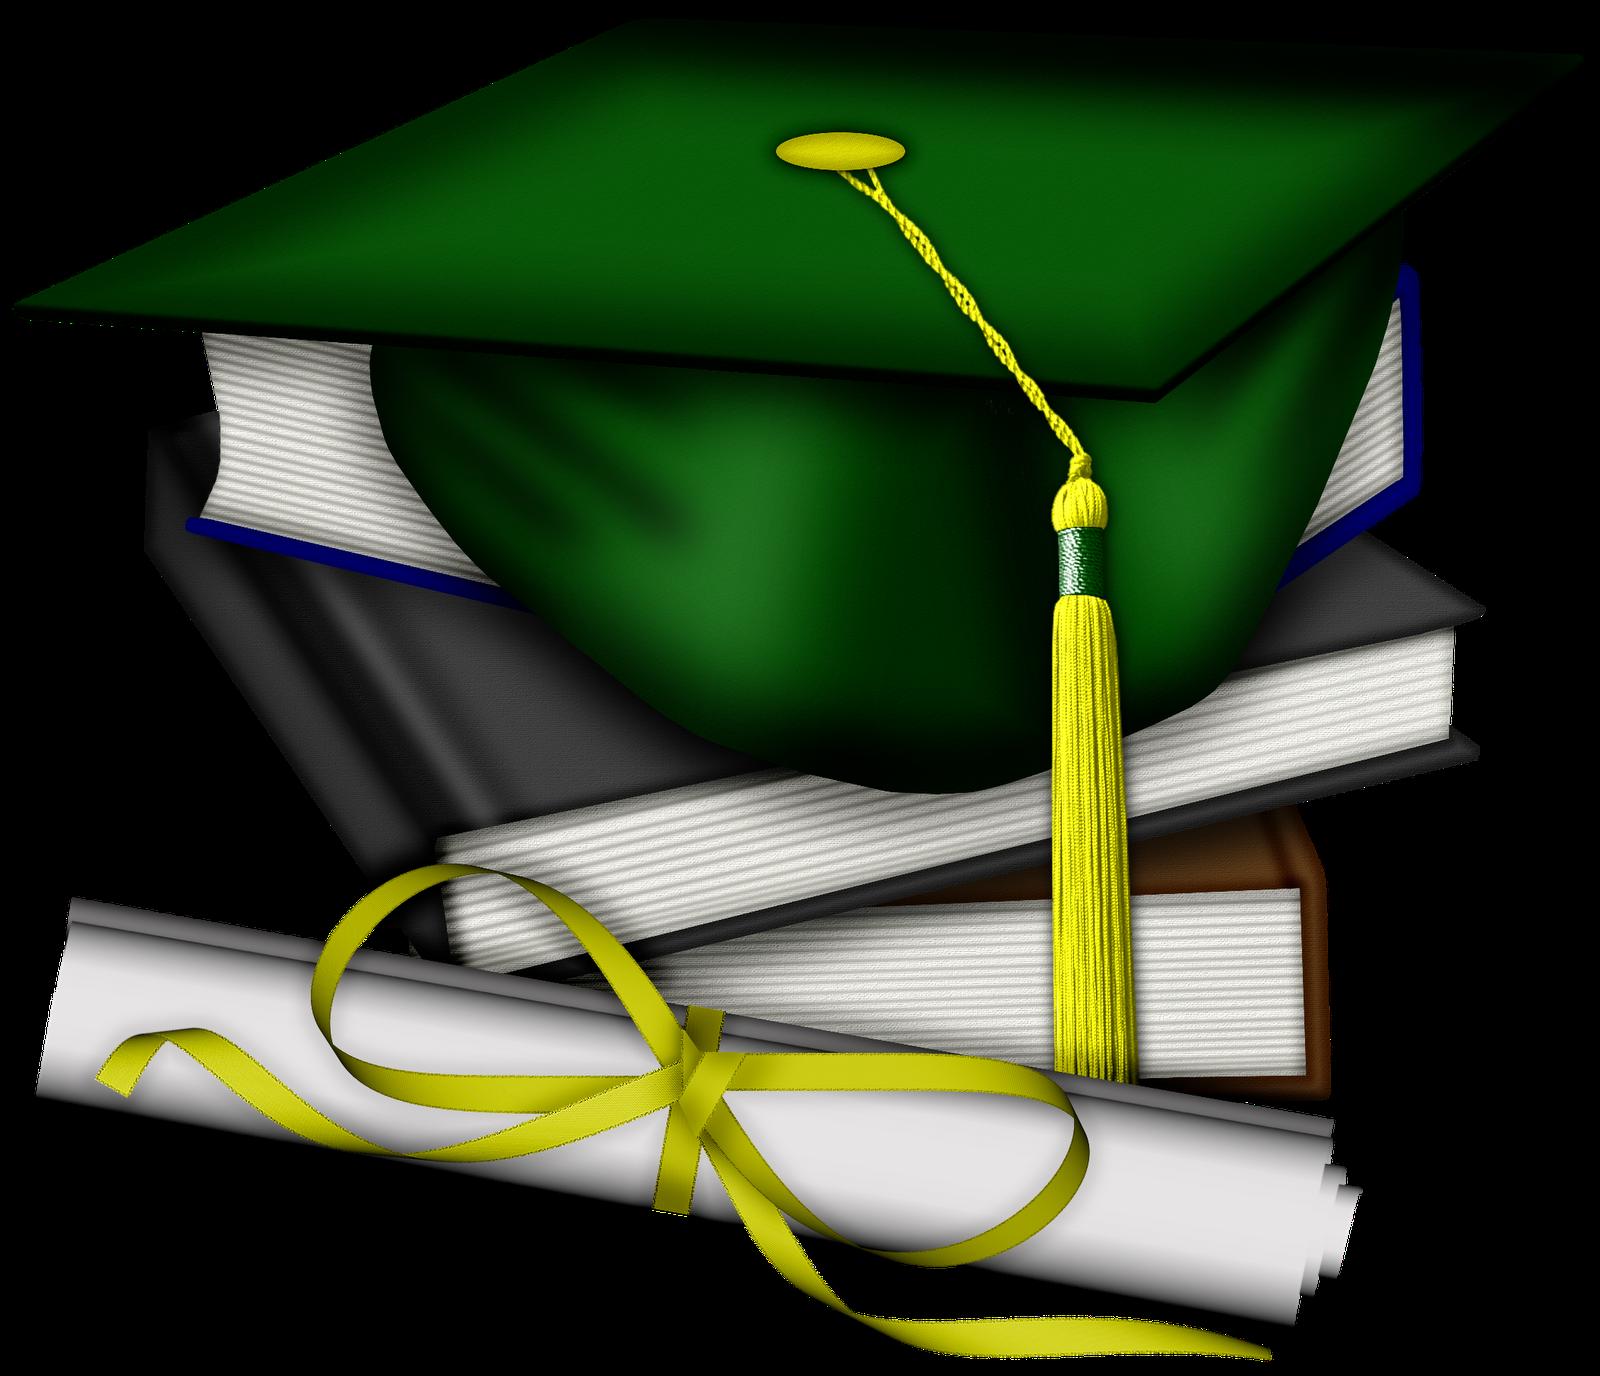 Green Graduation Cap Clip Art drawing free image